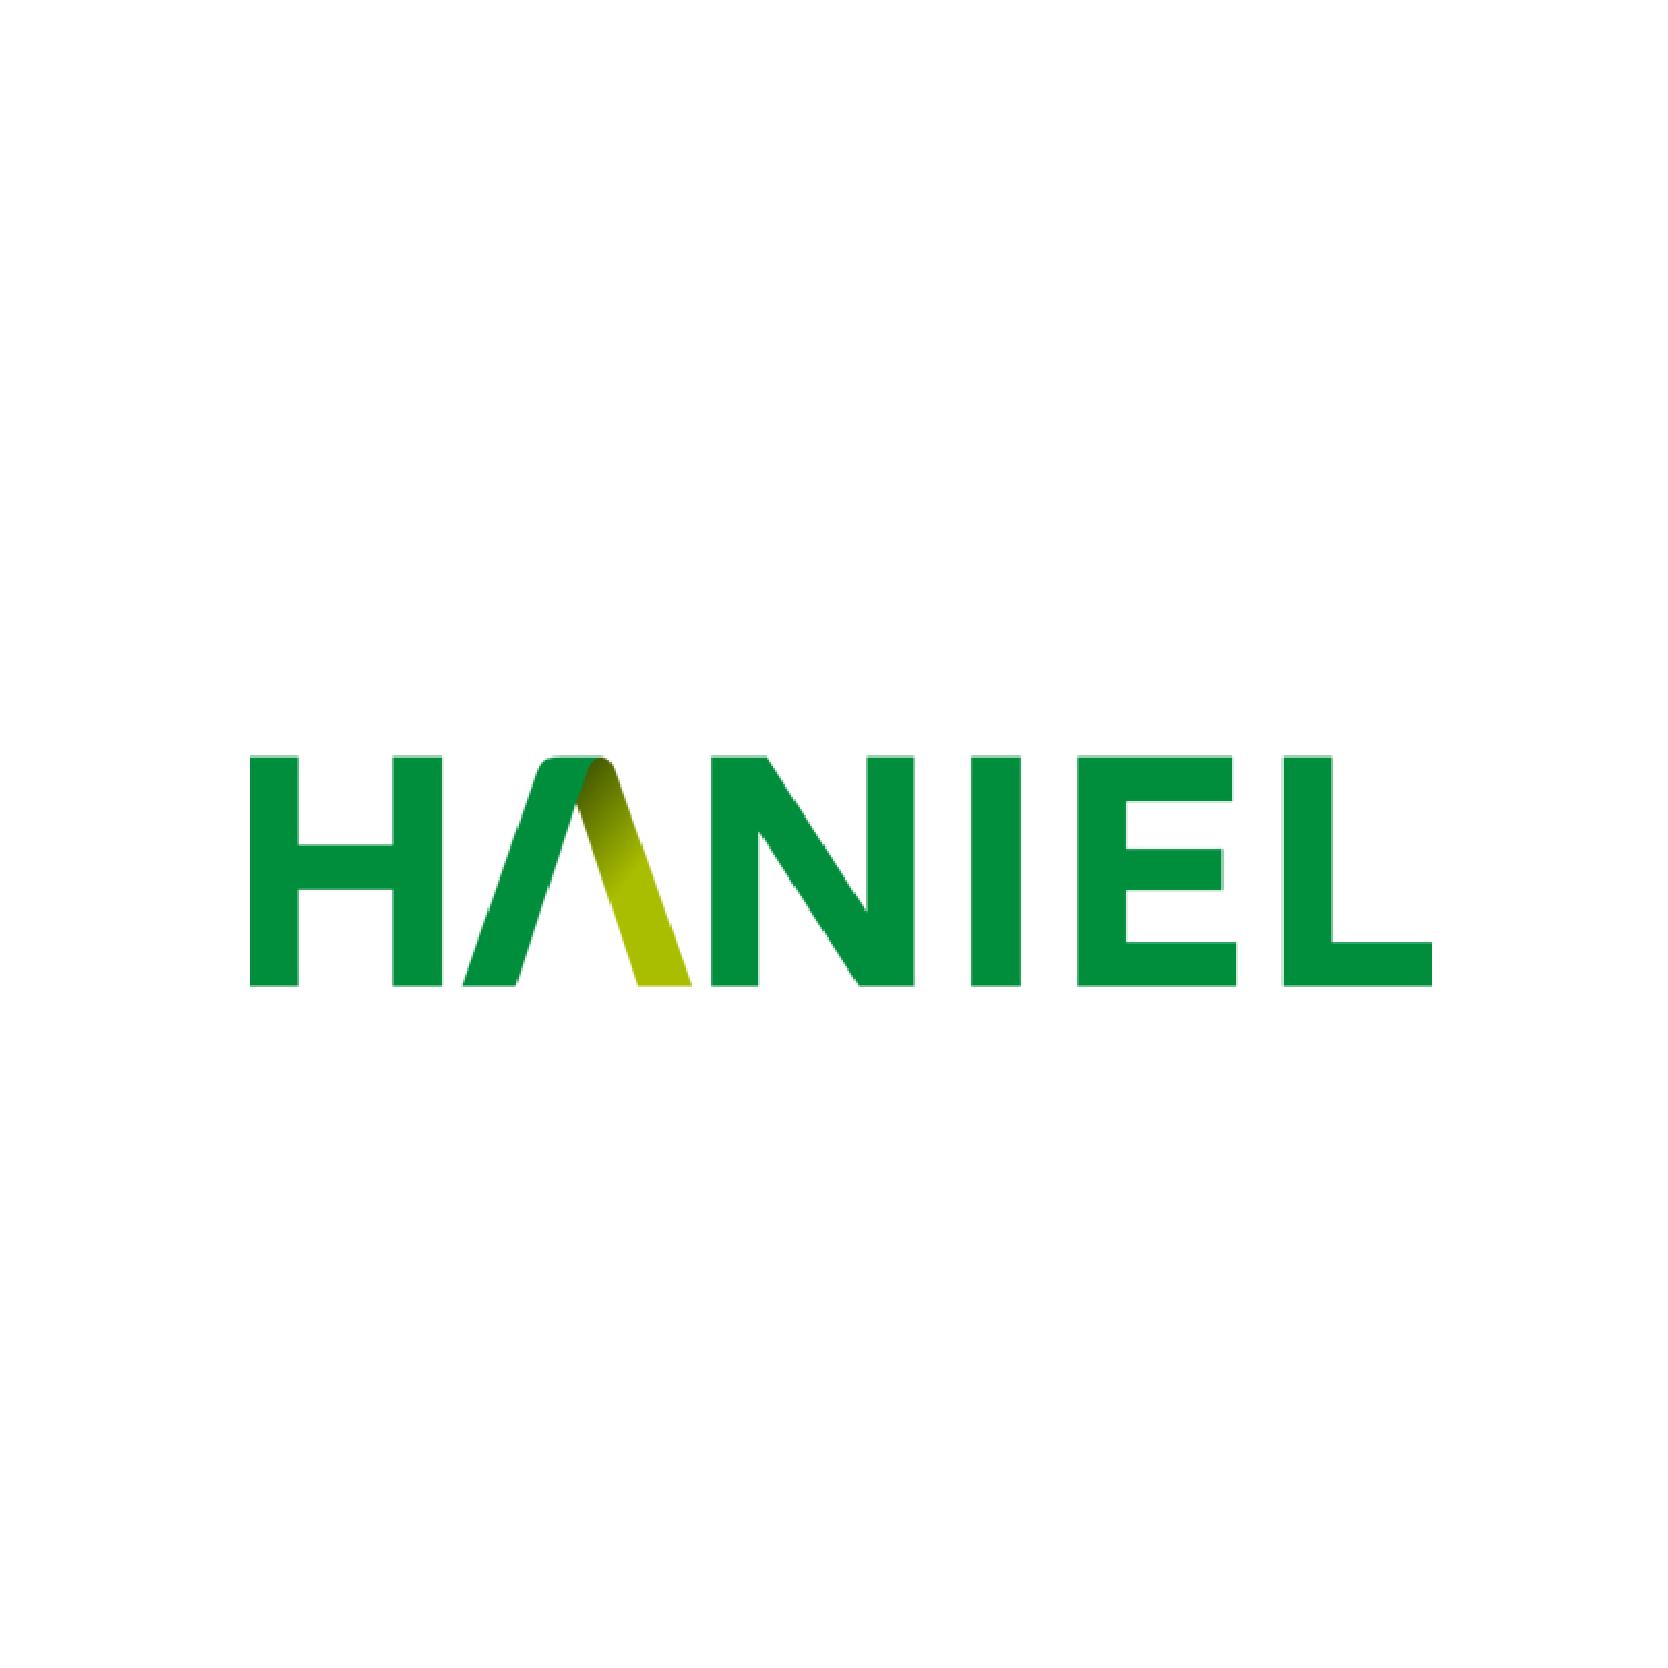 Haniel Logo